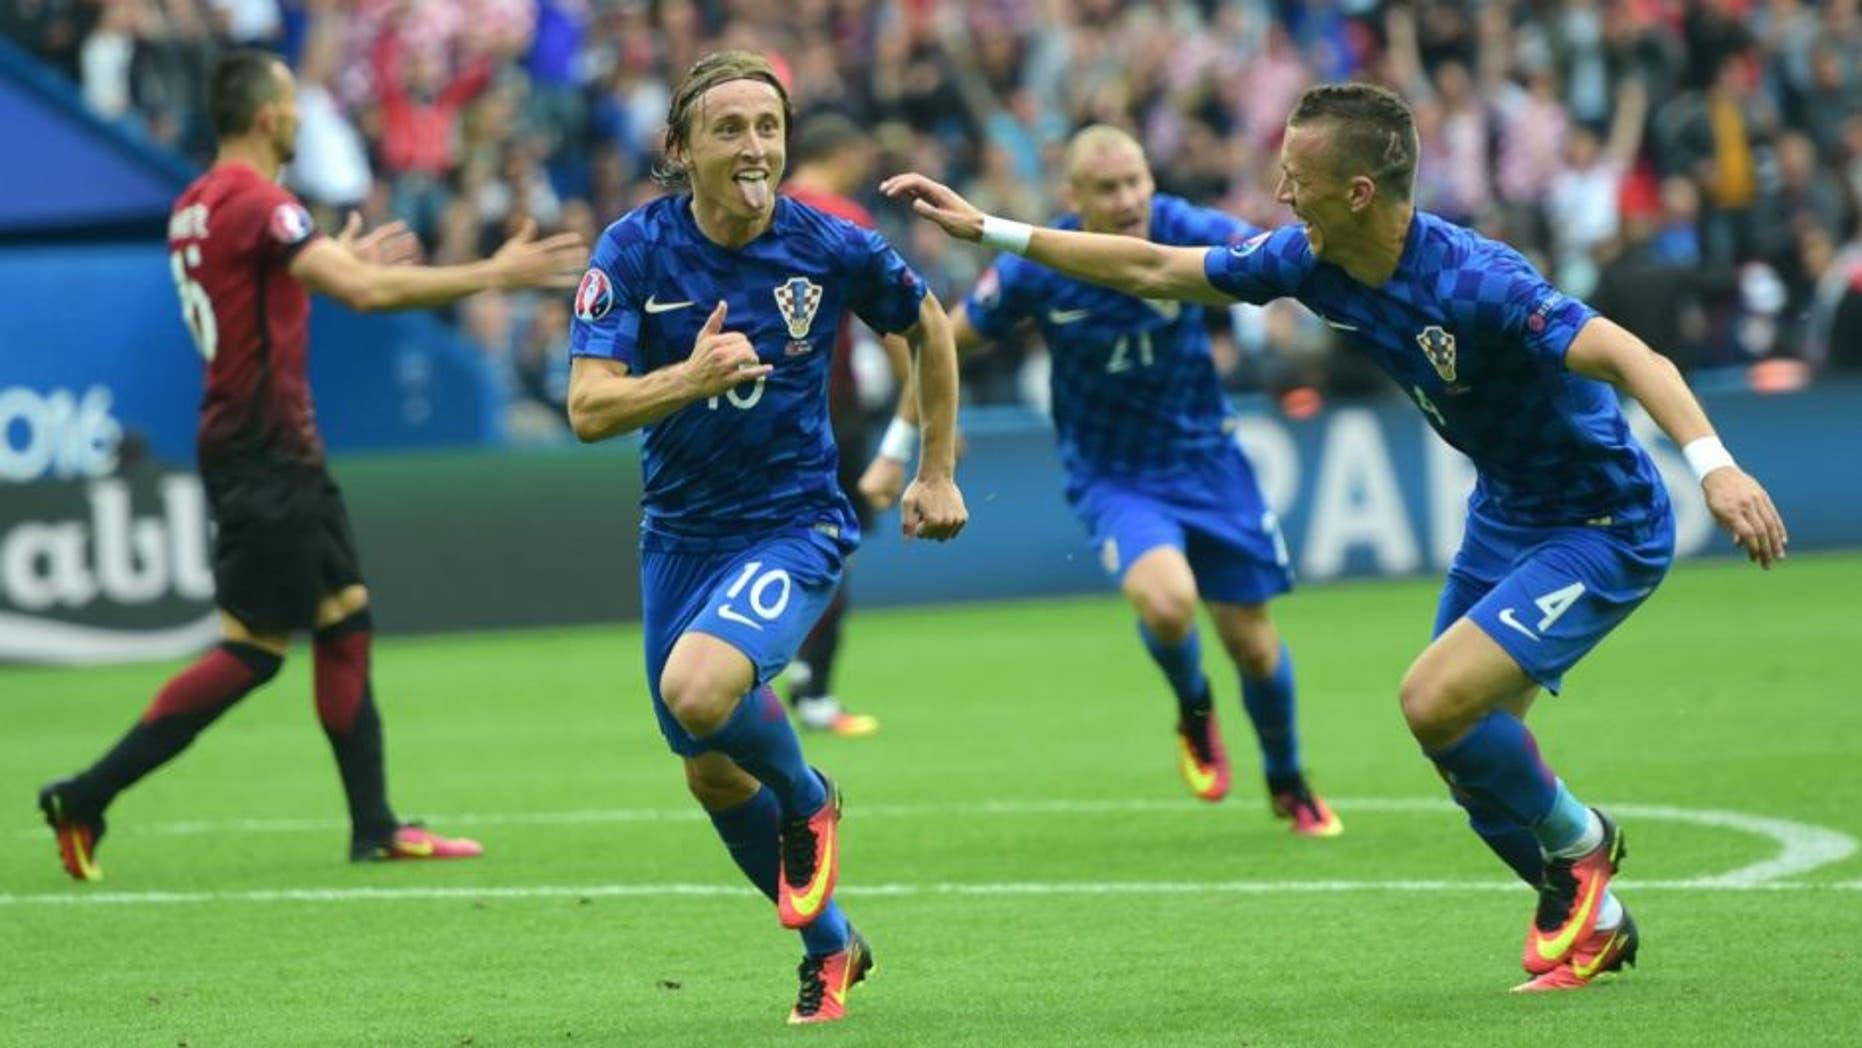 Croatia's midfielder Luka Modric (C) celebrates a goal during the Euro 2016 group D football match between Turkey and Croatia at Parc des Princes in Paris on June 12, 2016. / AFP / BULENT KILIC (Photo credit should read BULENT KILIC/AFP/Getty Images)